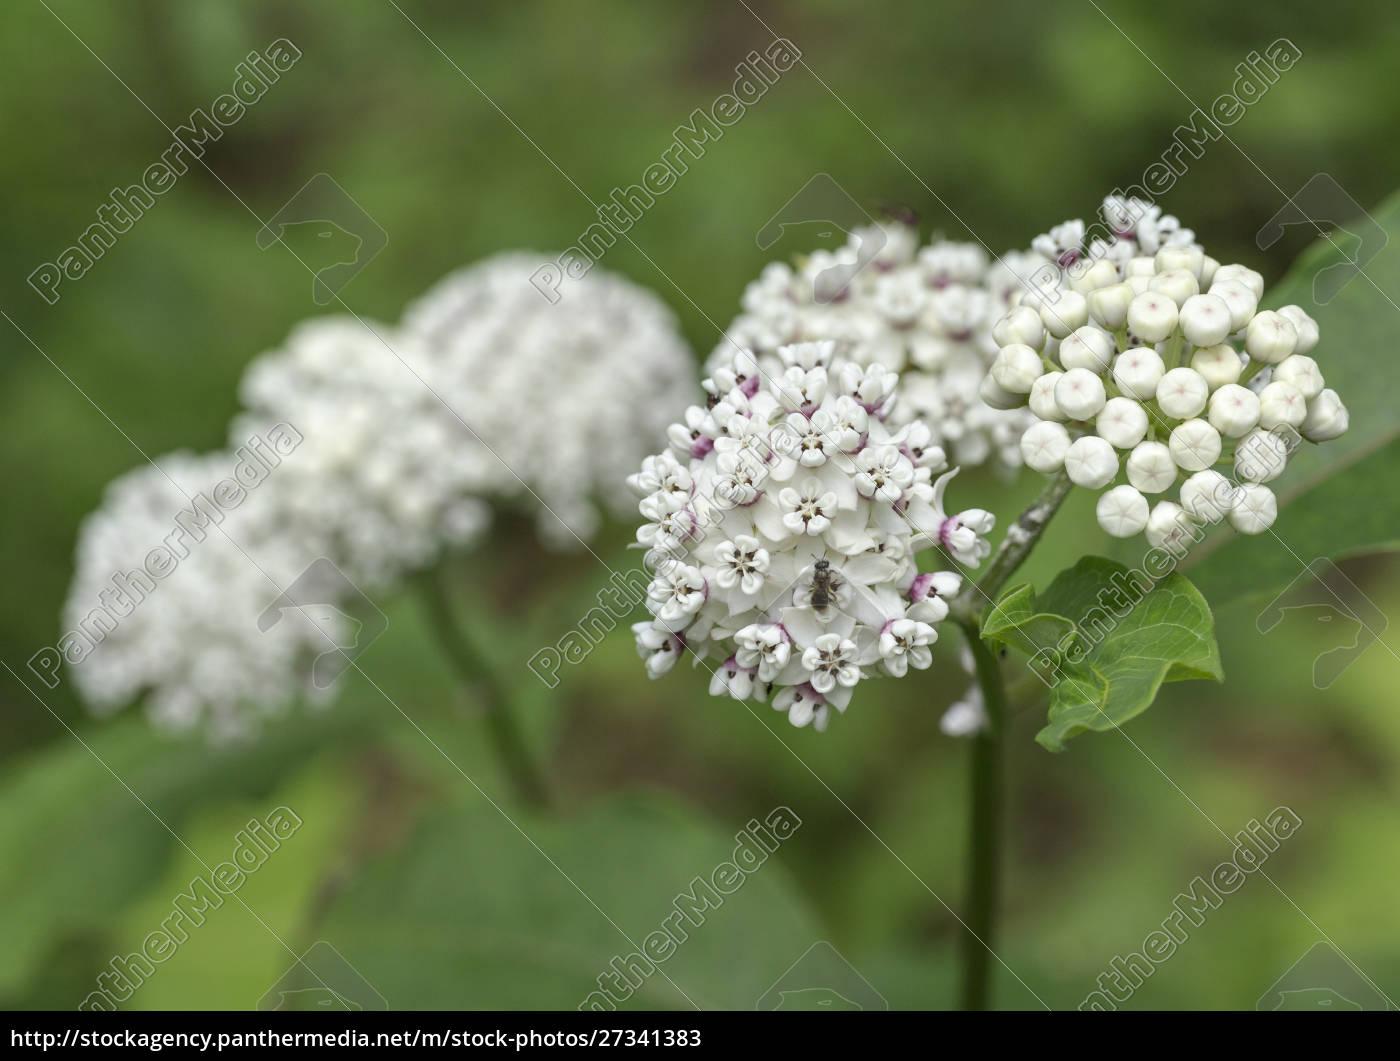 redring, milkweed, , white-flowered, milkweed, , asclepias, variegata, - 27341383